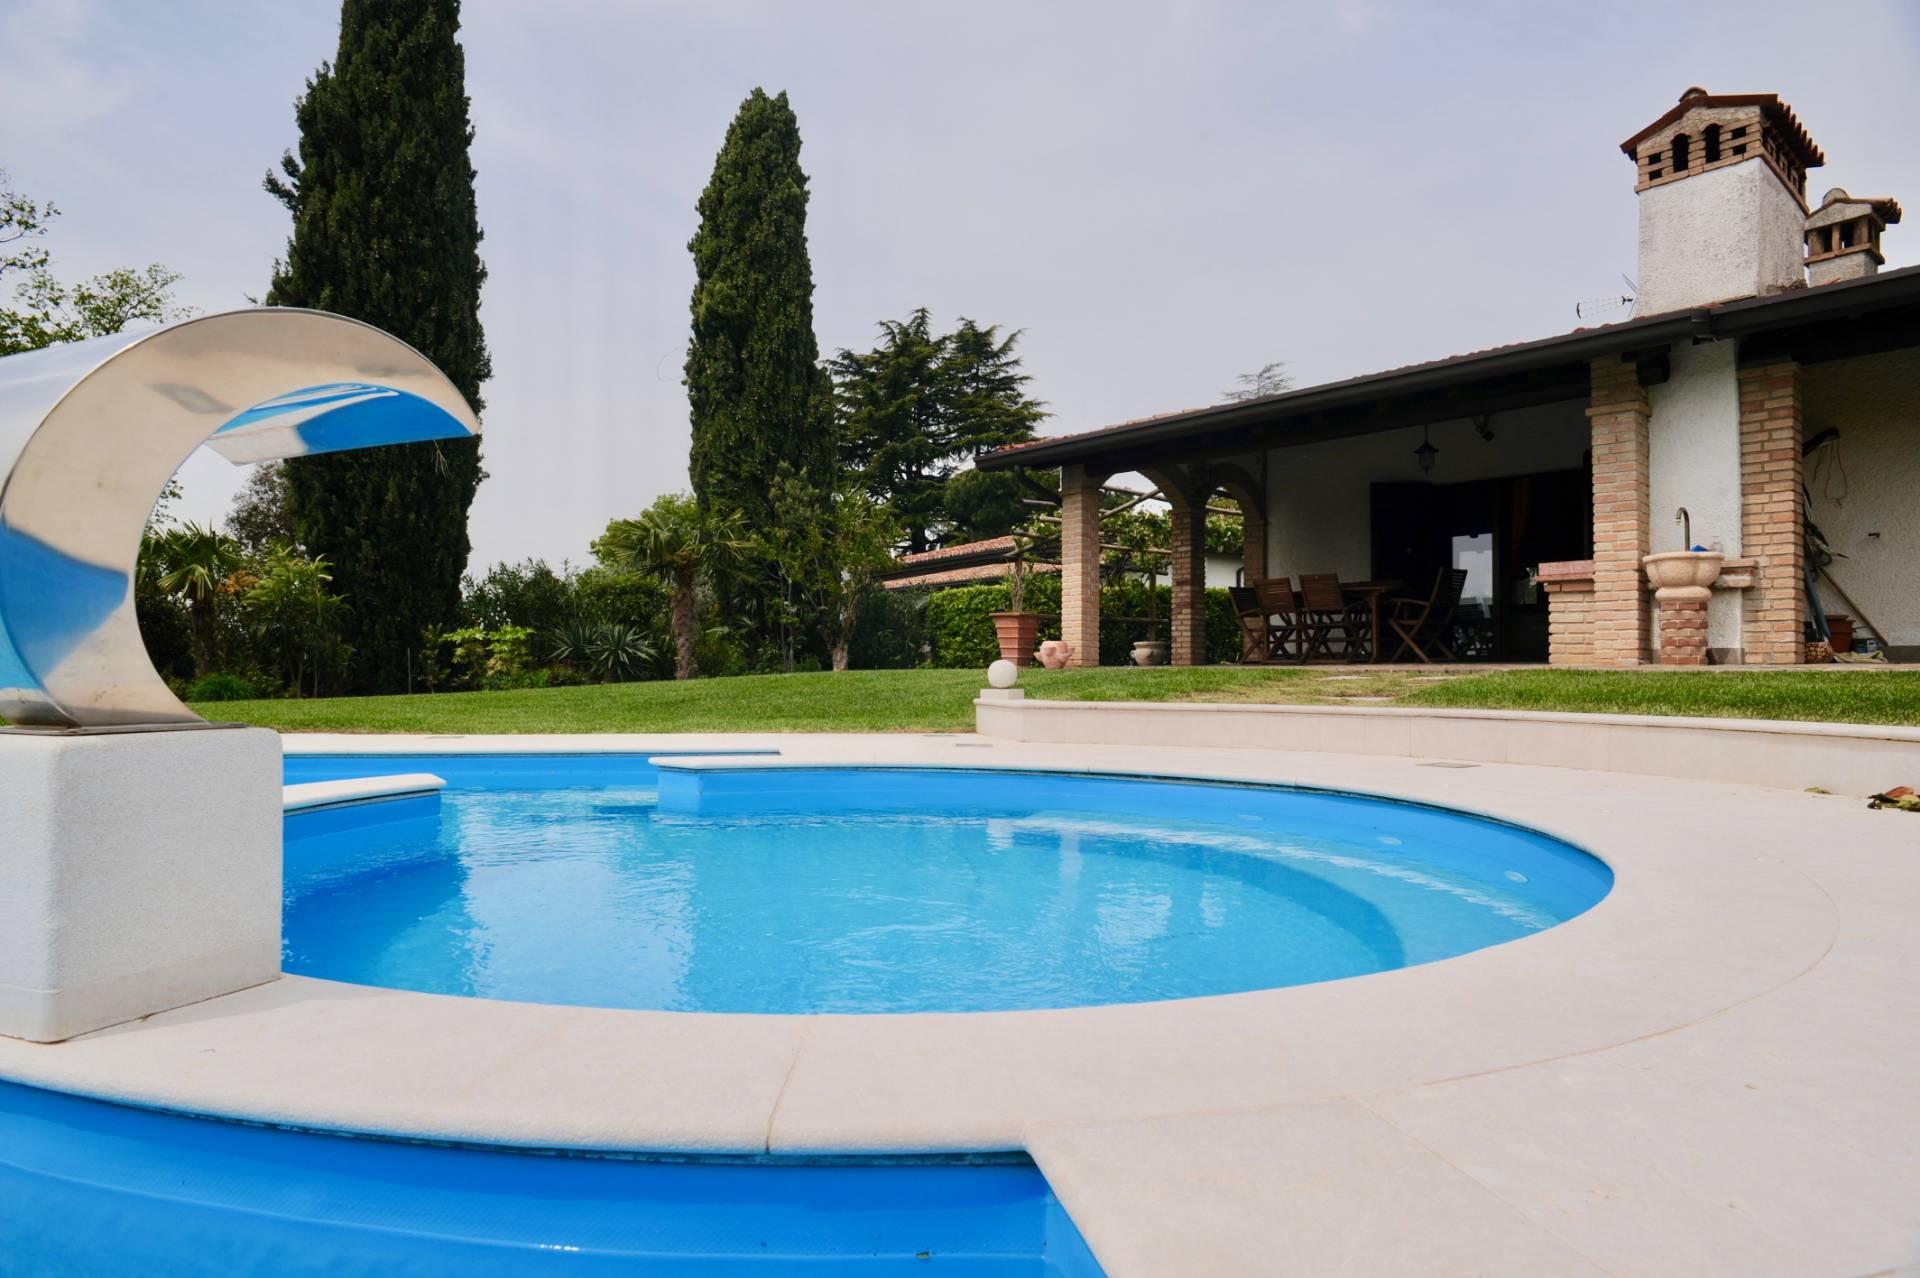 Villa in Vendita a Padenghe Sul Garda: 3 locali, 100 mq - Foto 18